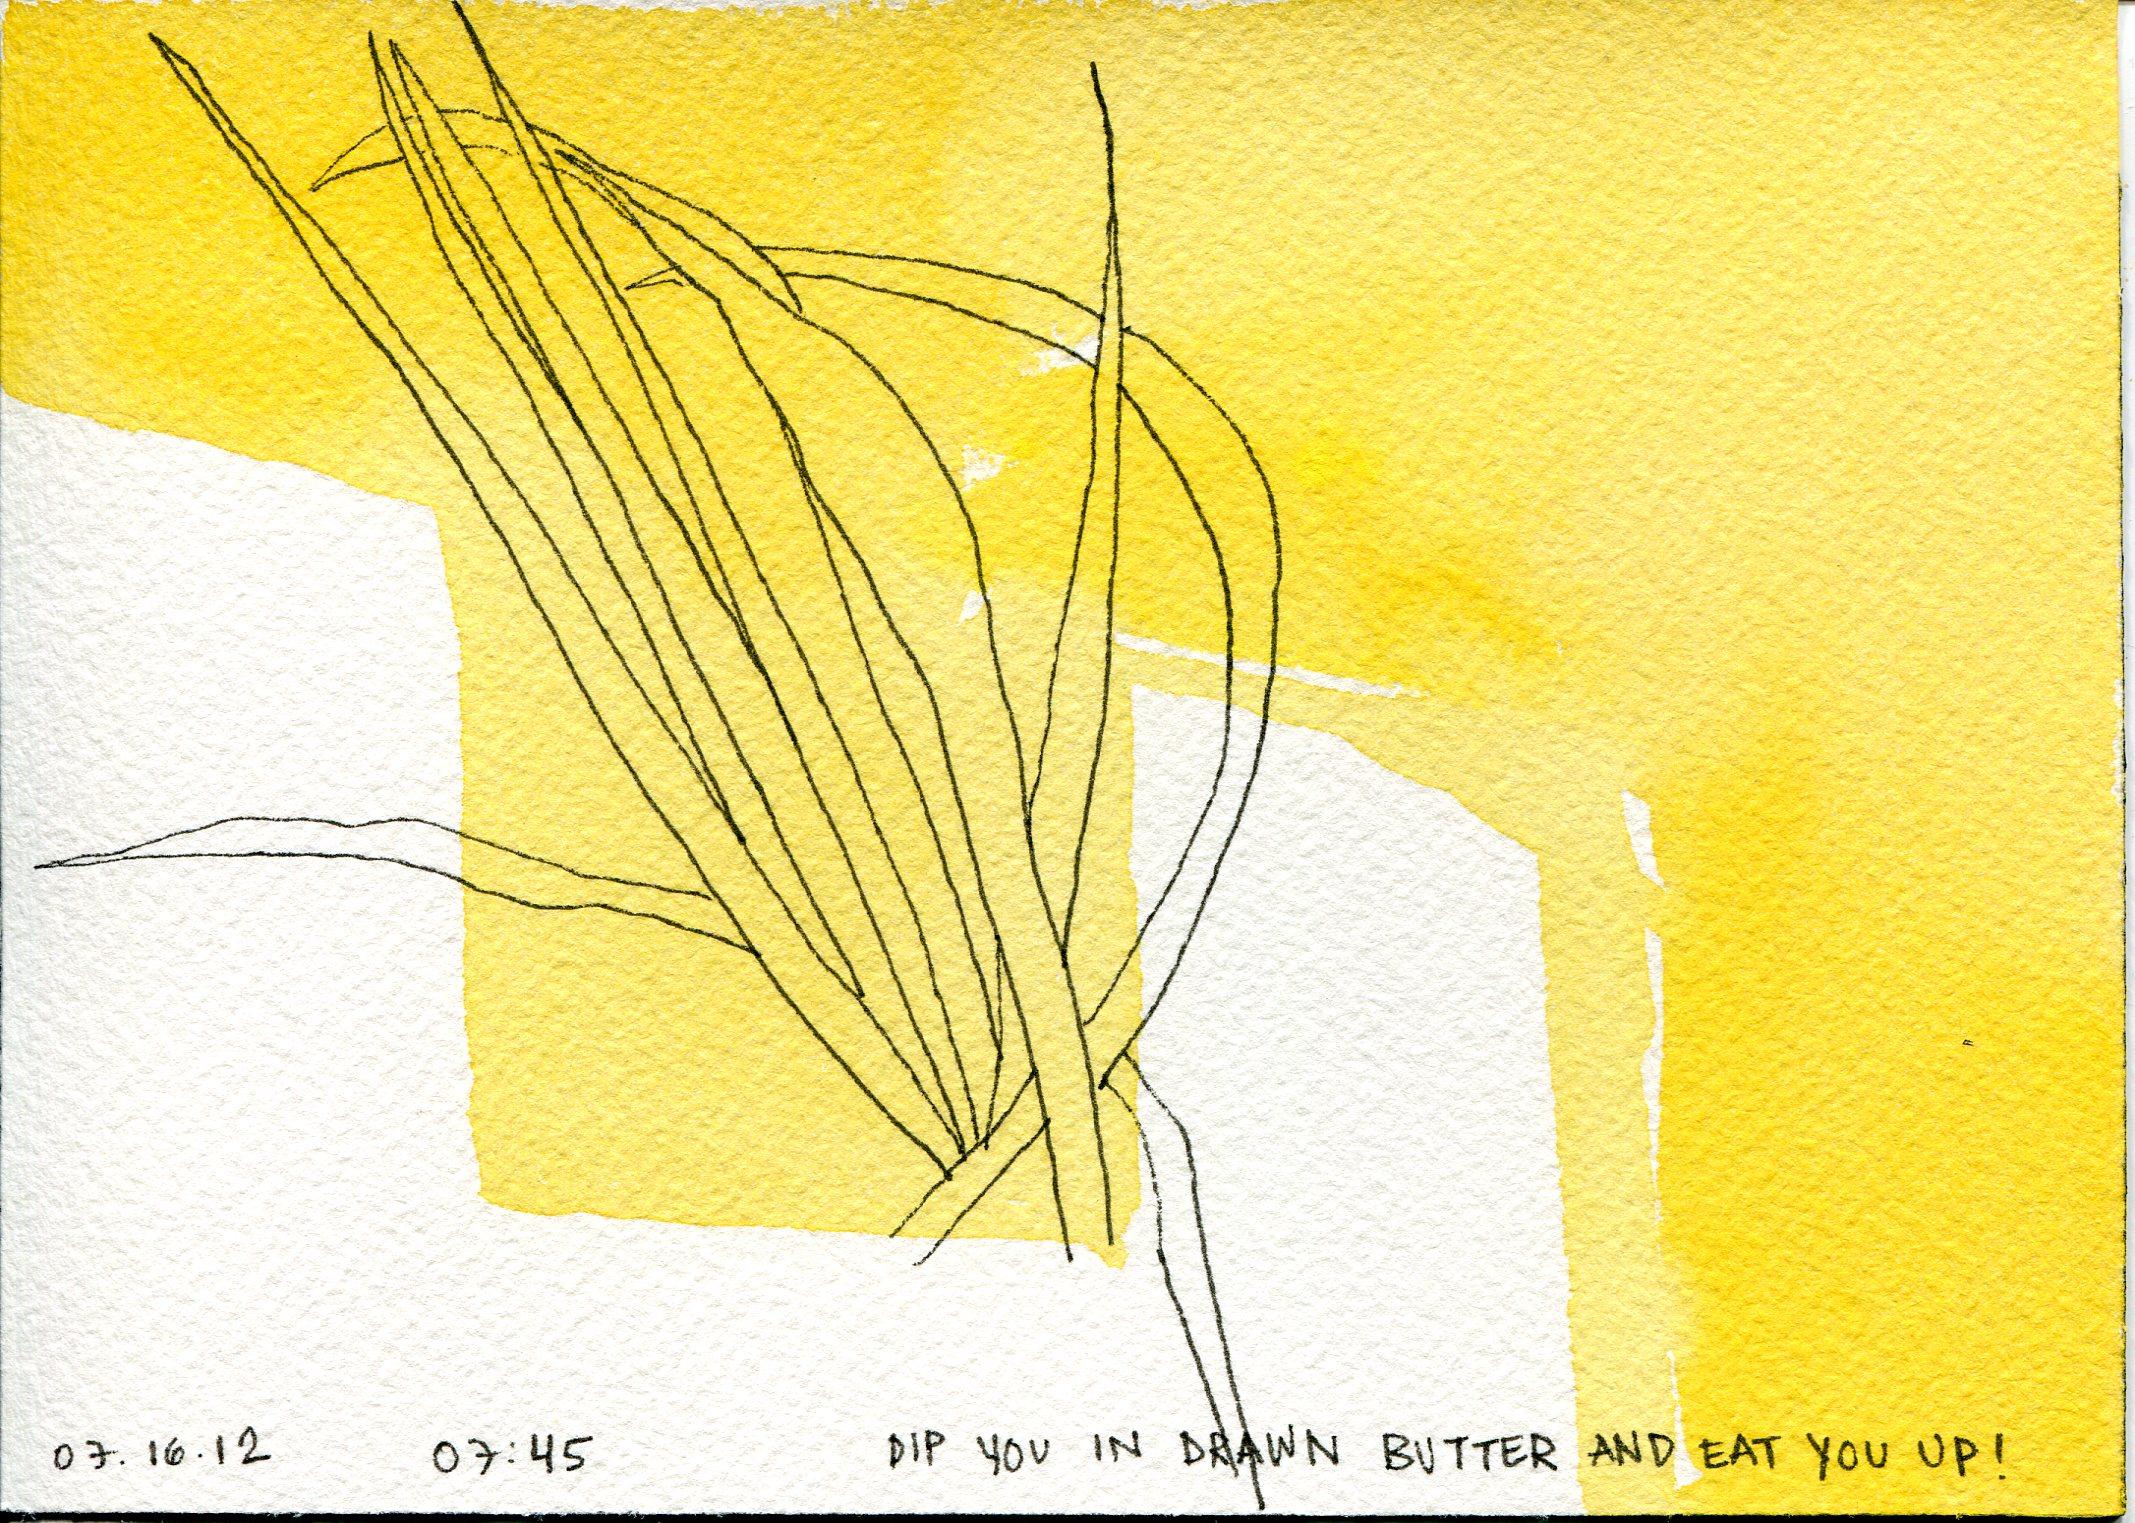 2012-07-21 drawing002.jpg